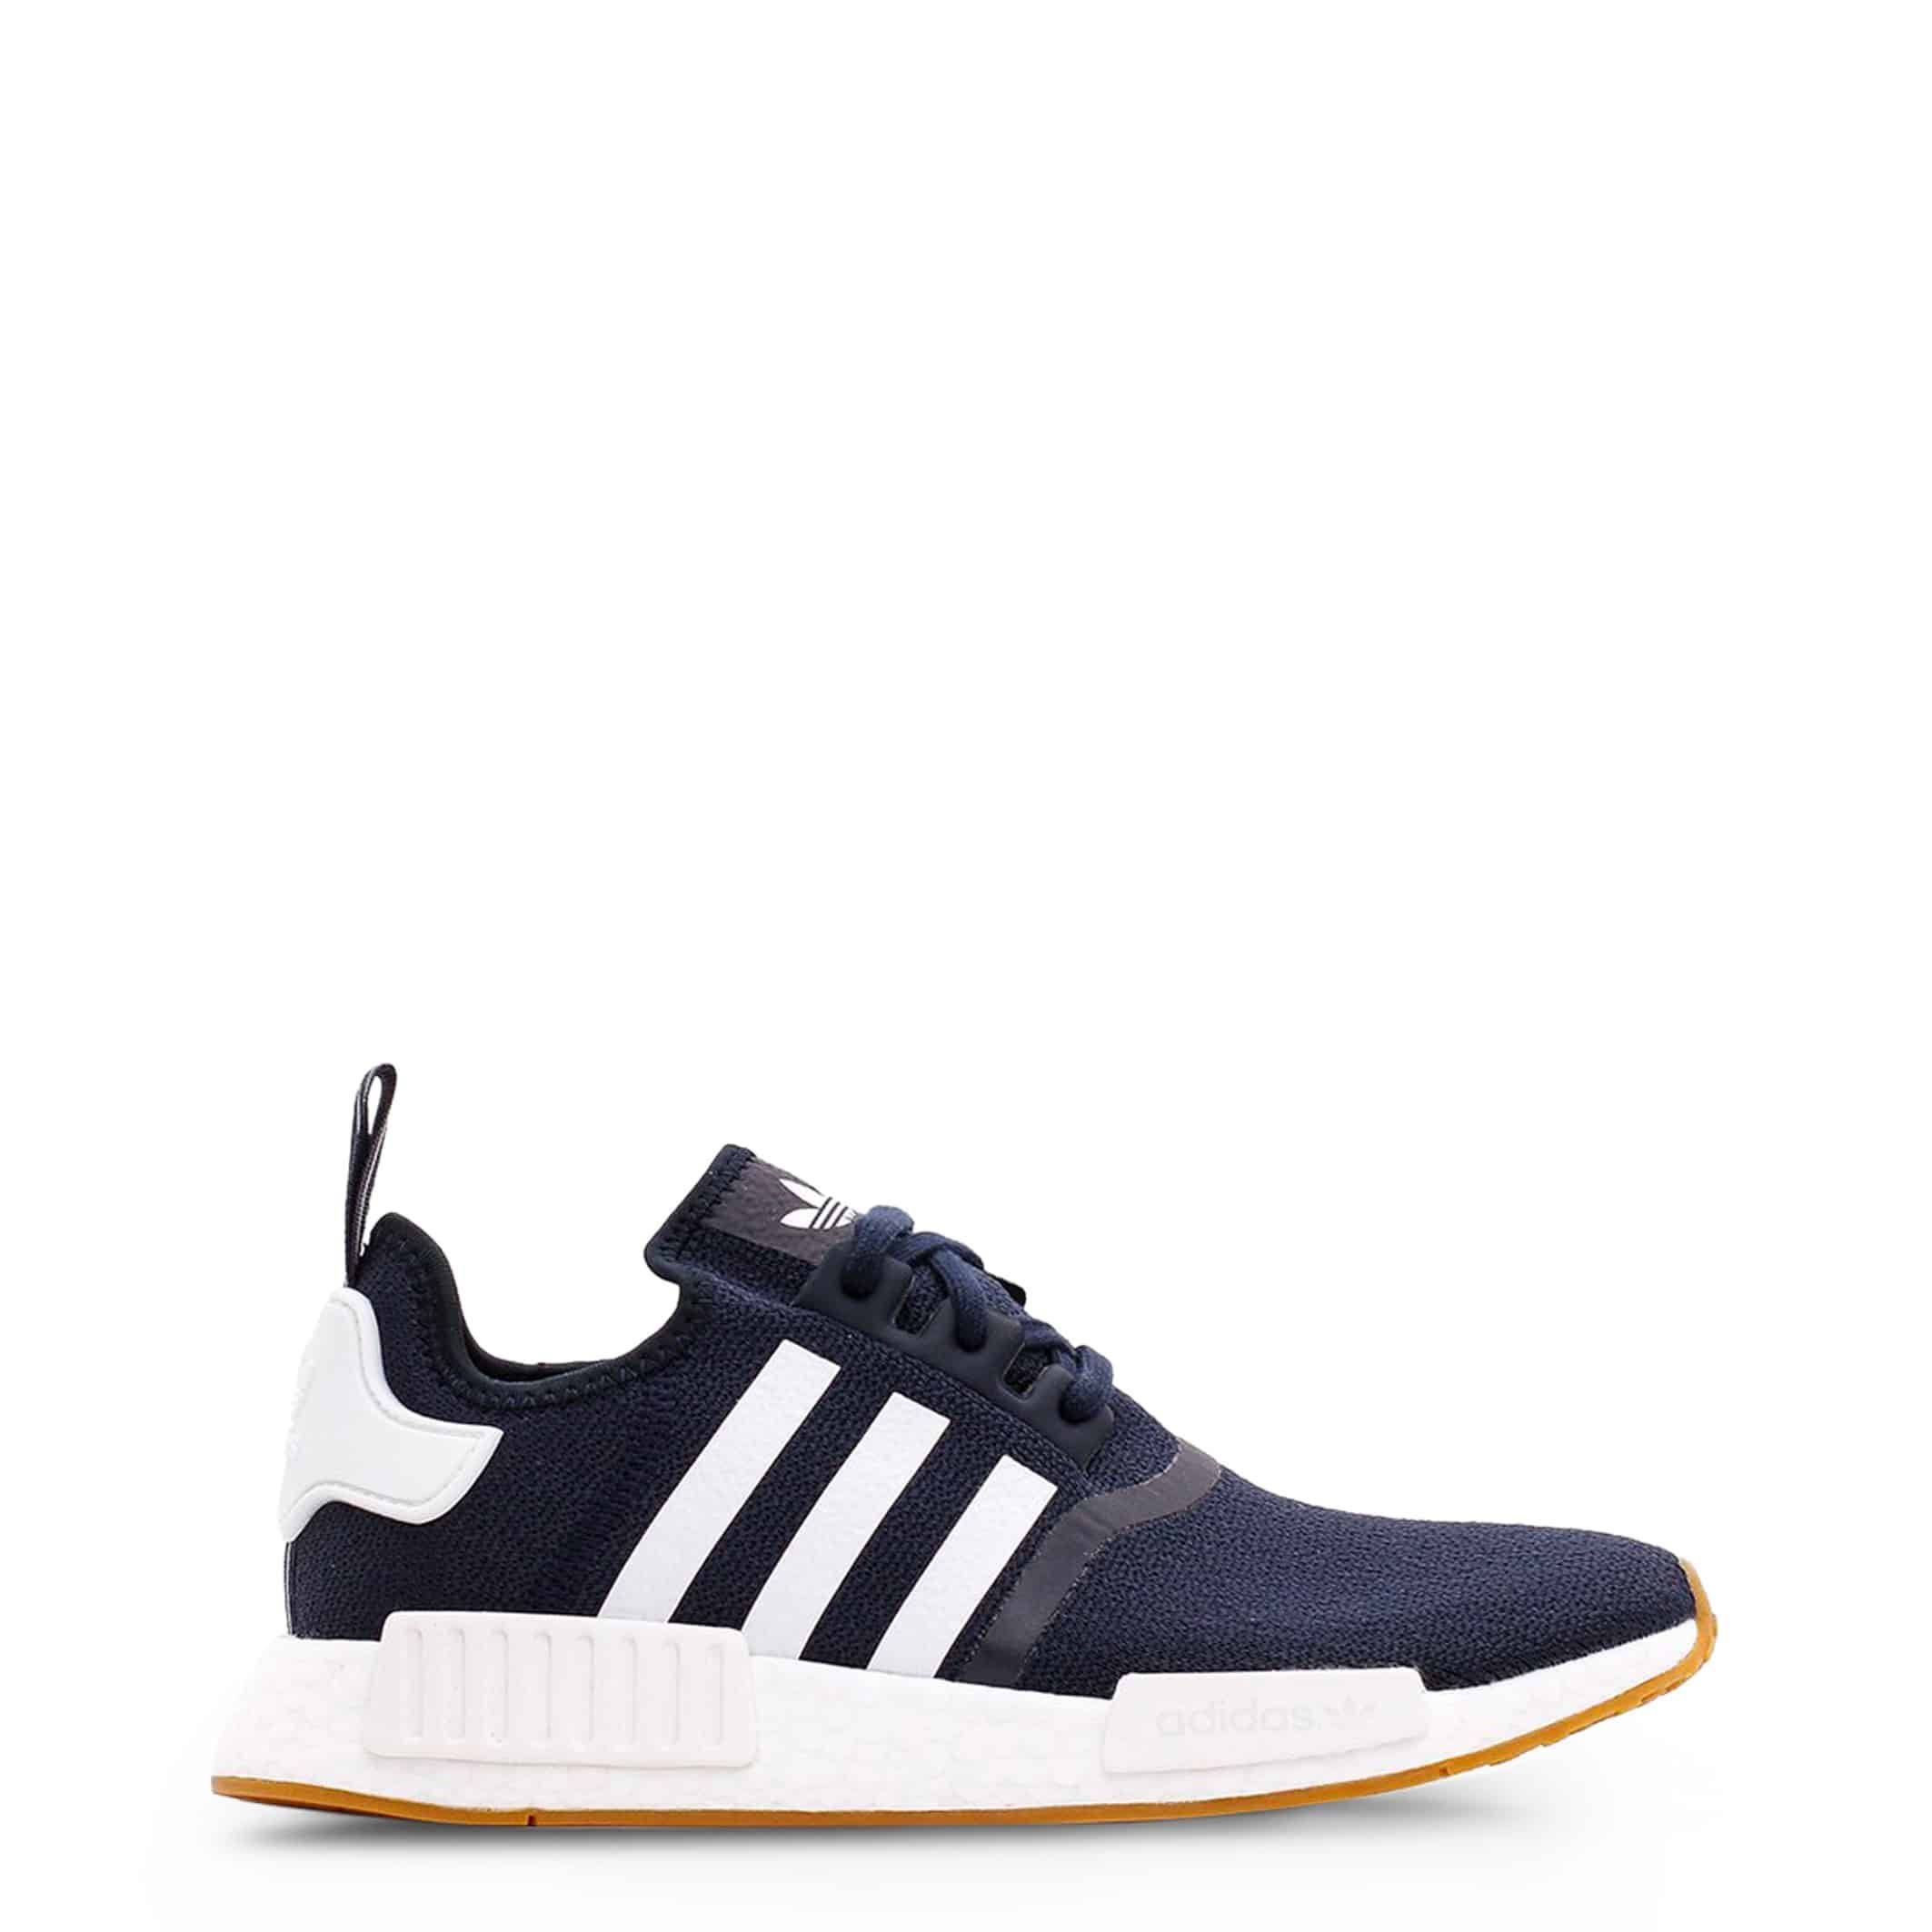 Adidas – NMD_R1 – Blauw Designeritems.nl